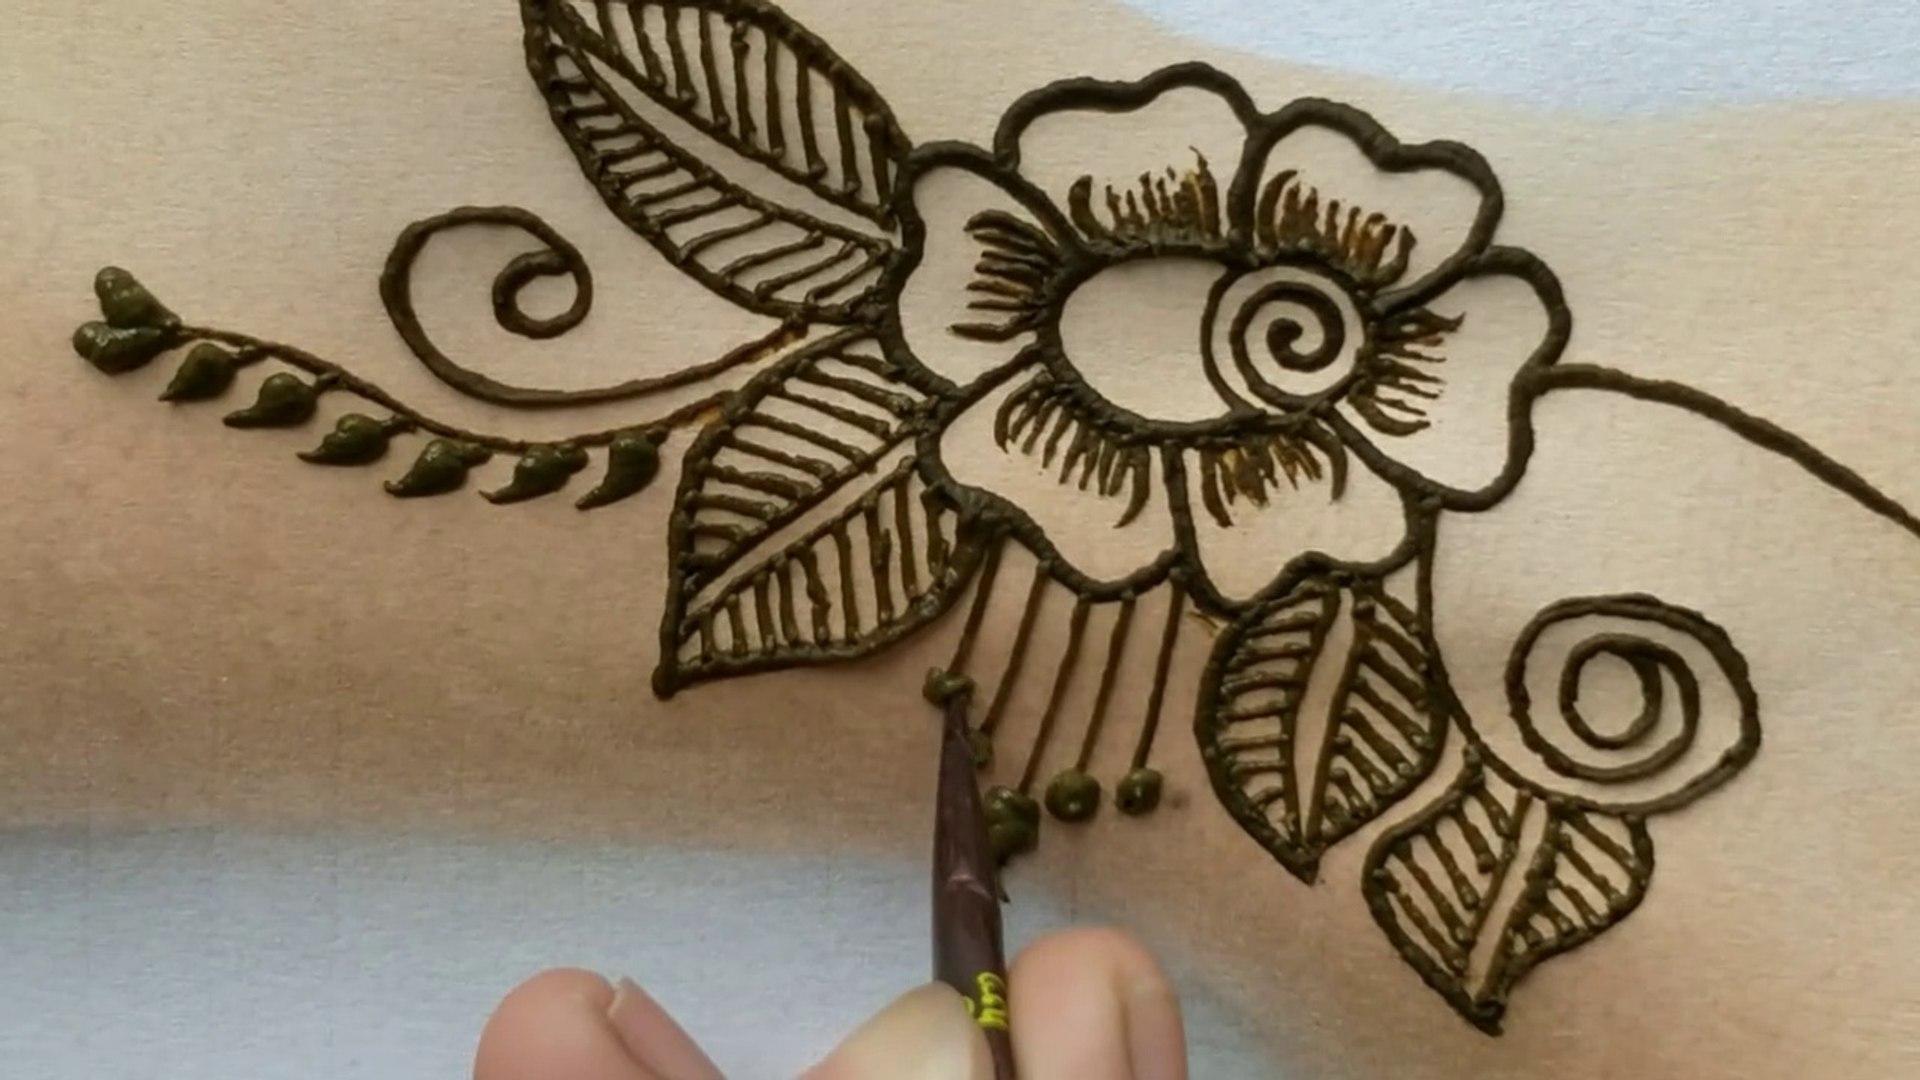 Very Simple Easy Beautiful Mehndi Designs Tutorial 2019 Latest Fancy Rose Henna Mehndi Designs Video Dailymotion,Cute Wedding Indian Lehenga Designs For Girls Wedding